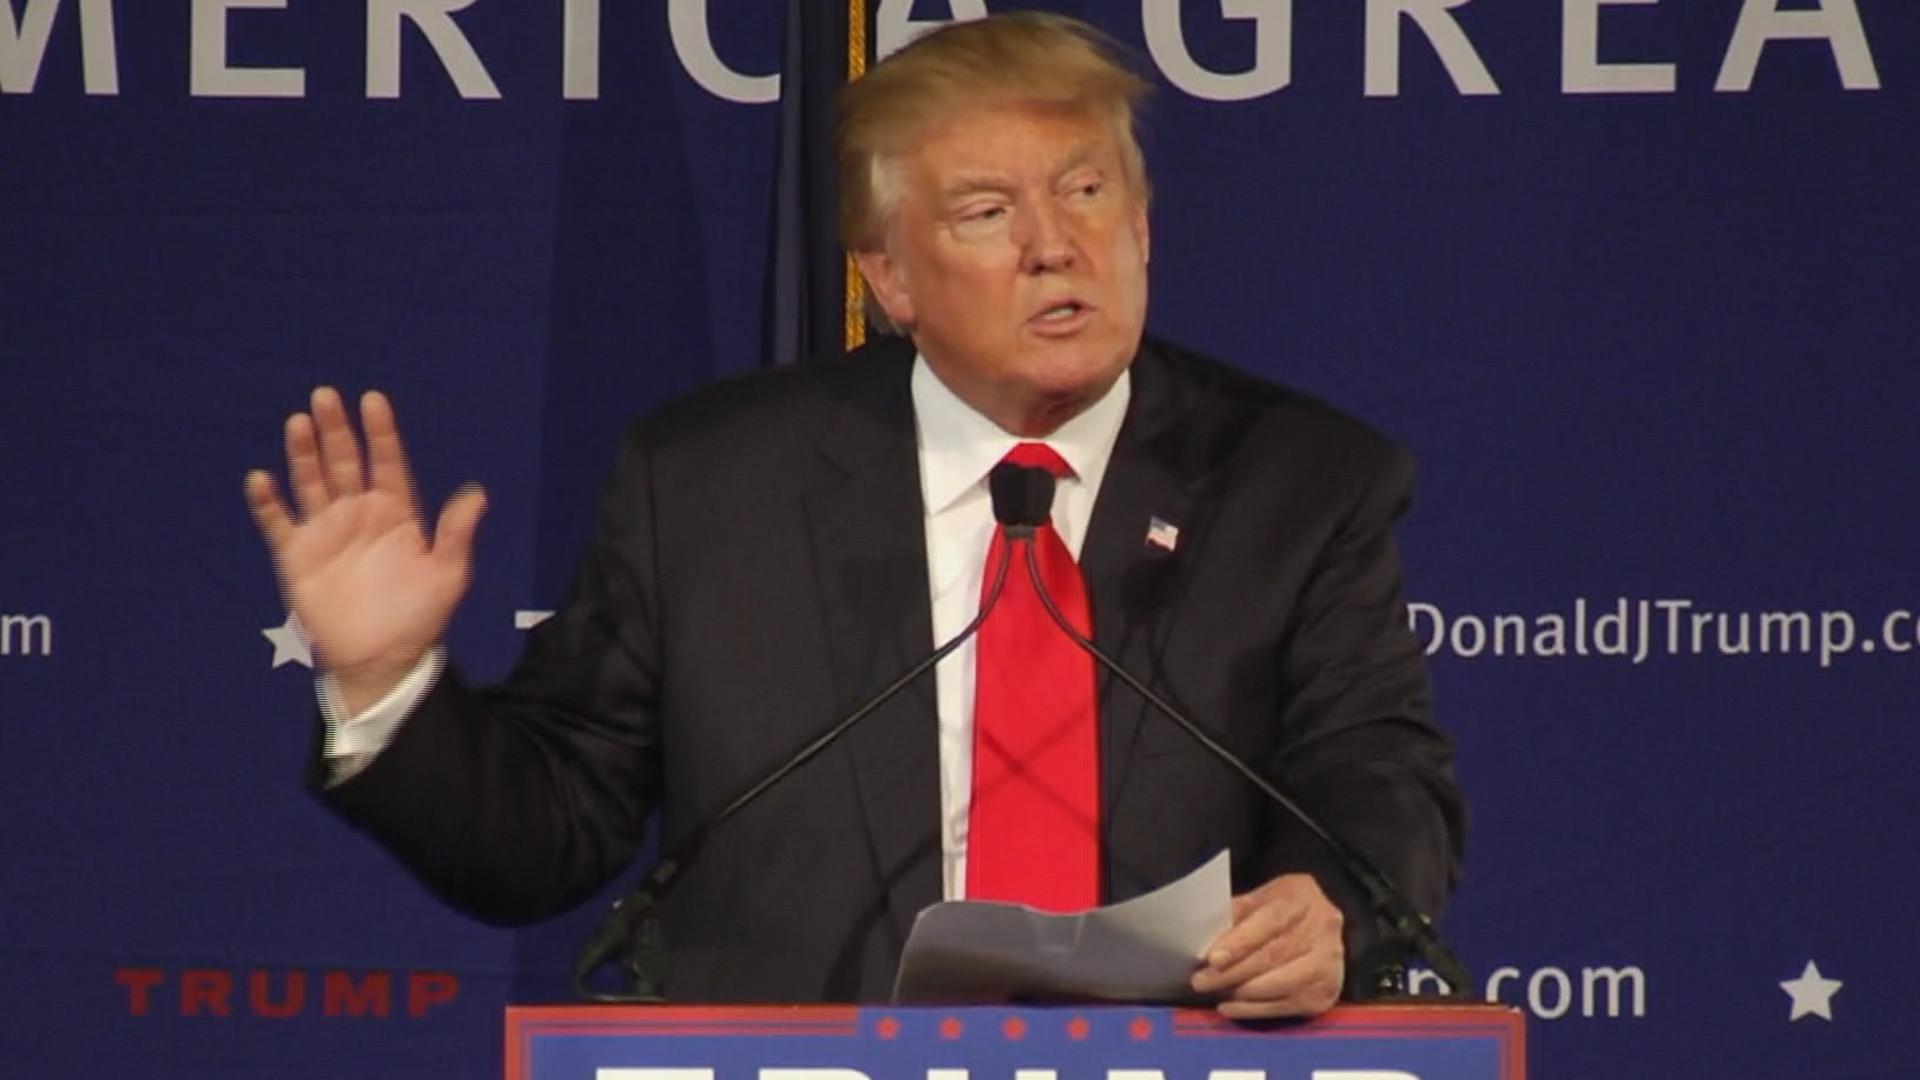 At South Carolina Rally, Trump Defiant, Steadfast on Muslim Ban